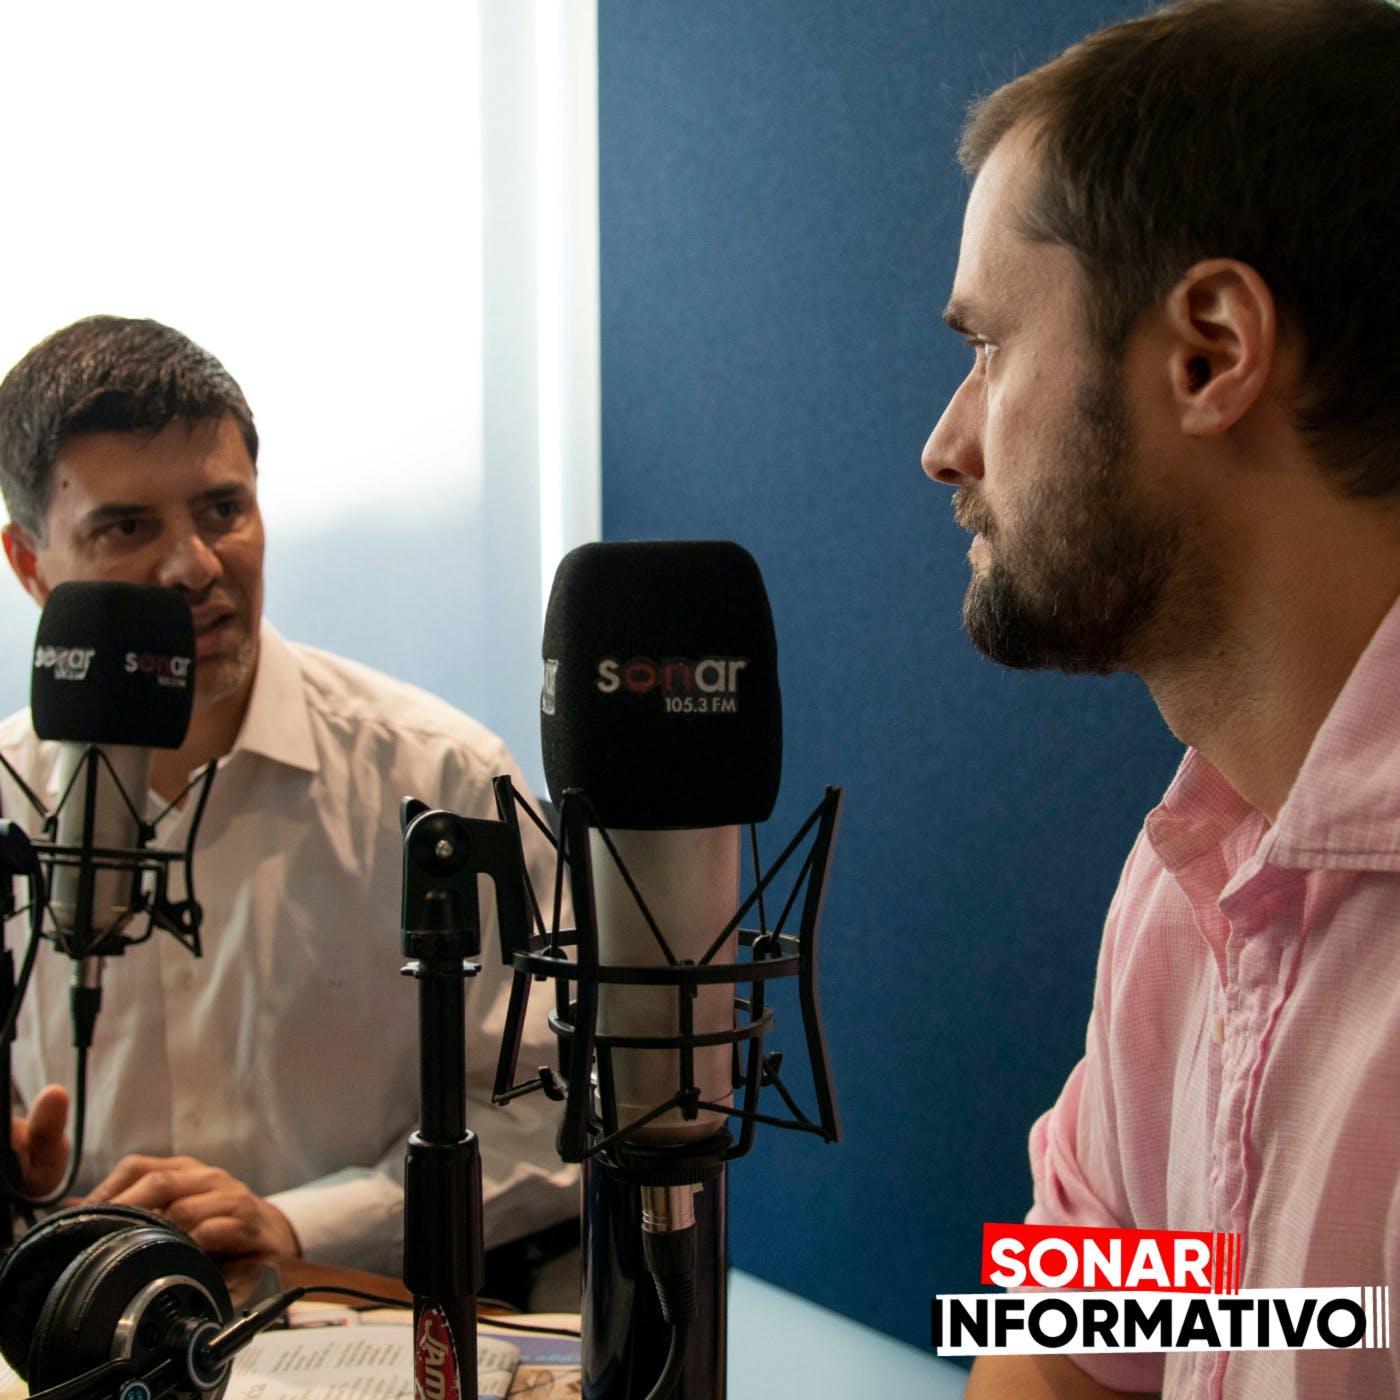 Debate Constitucional en la Bancada Sonar - Especial Crisis Social - Emisor Podcasting